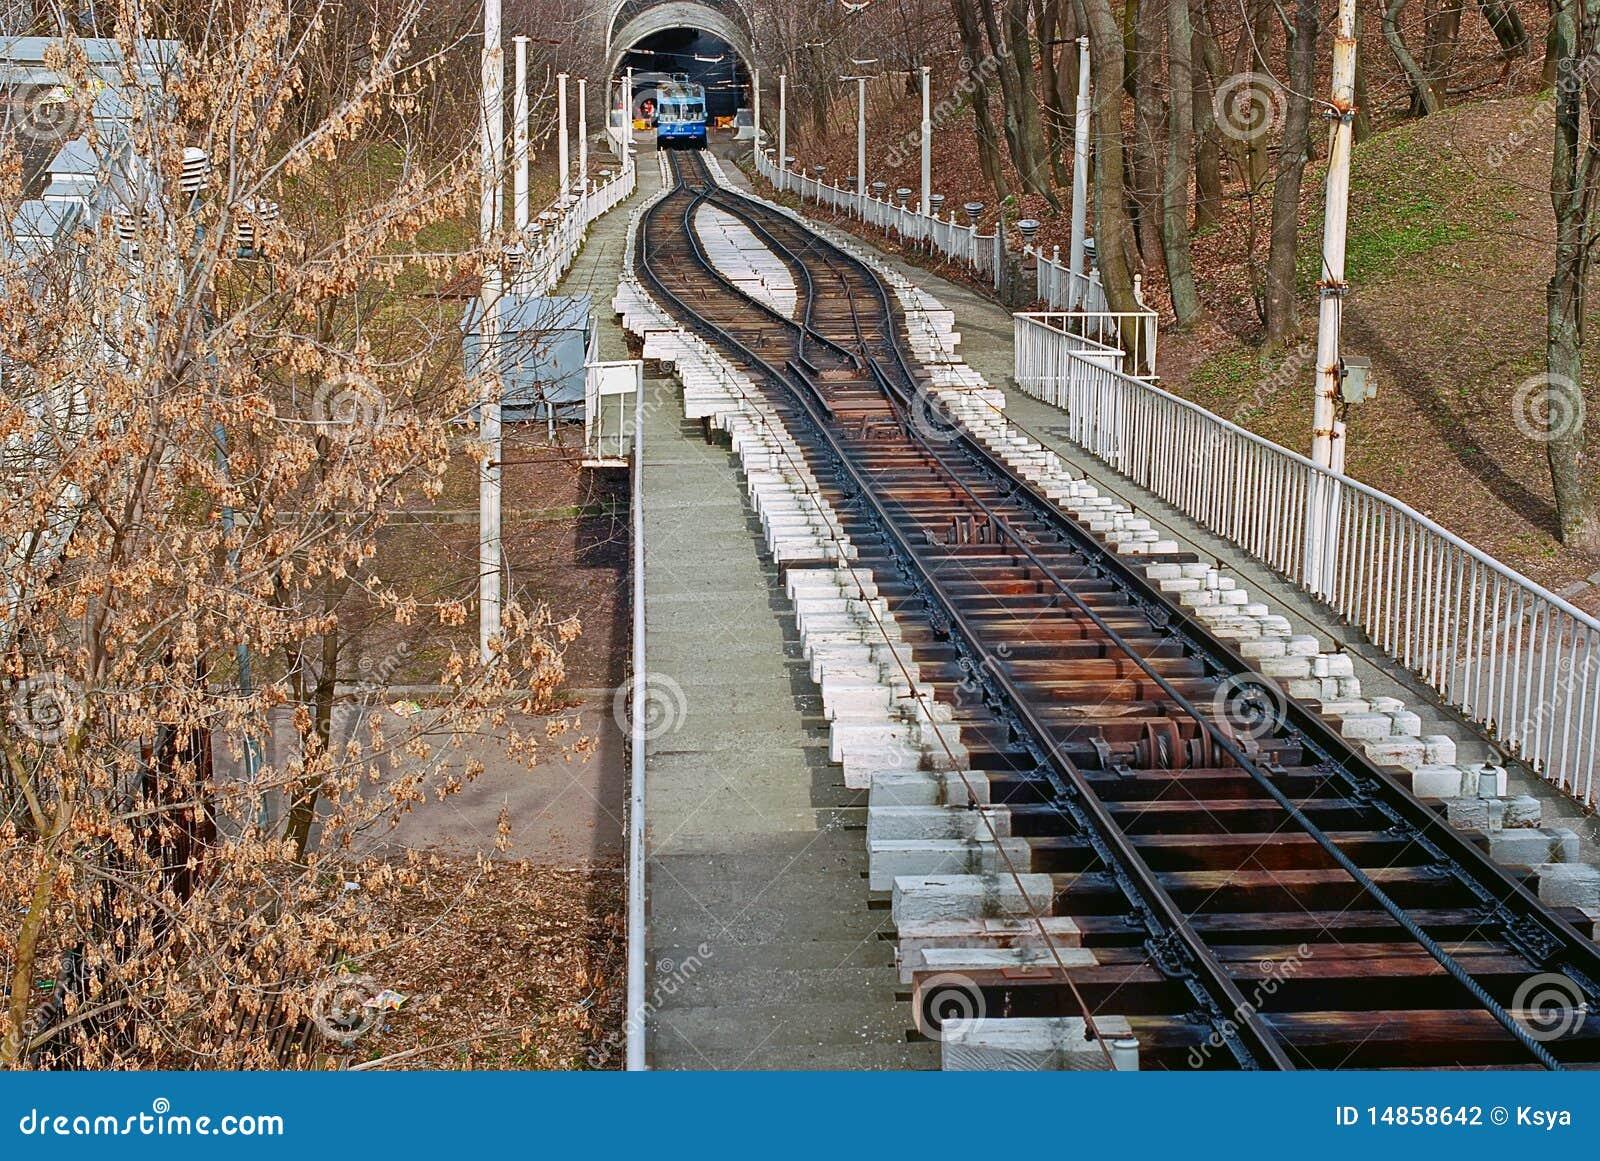 Kiev old cable-railway